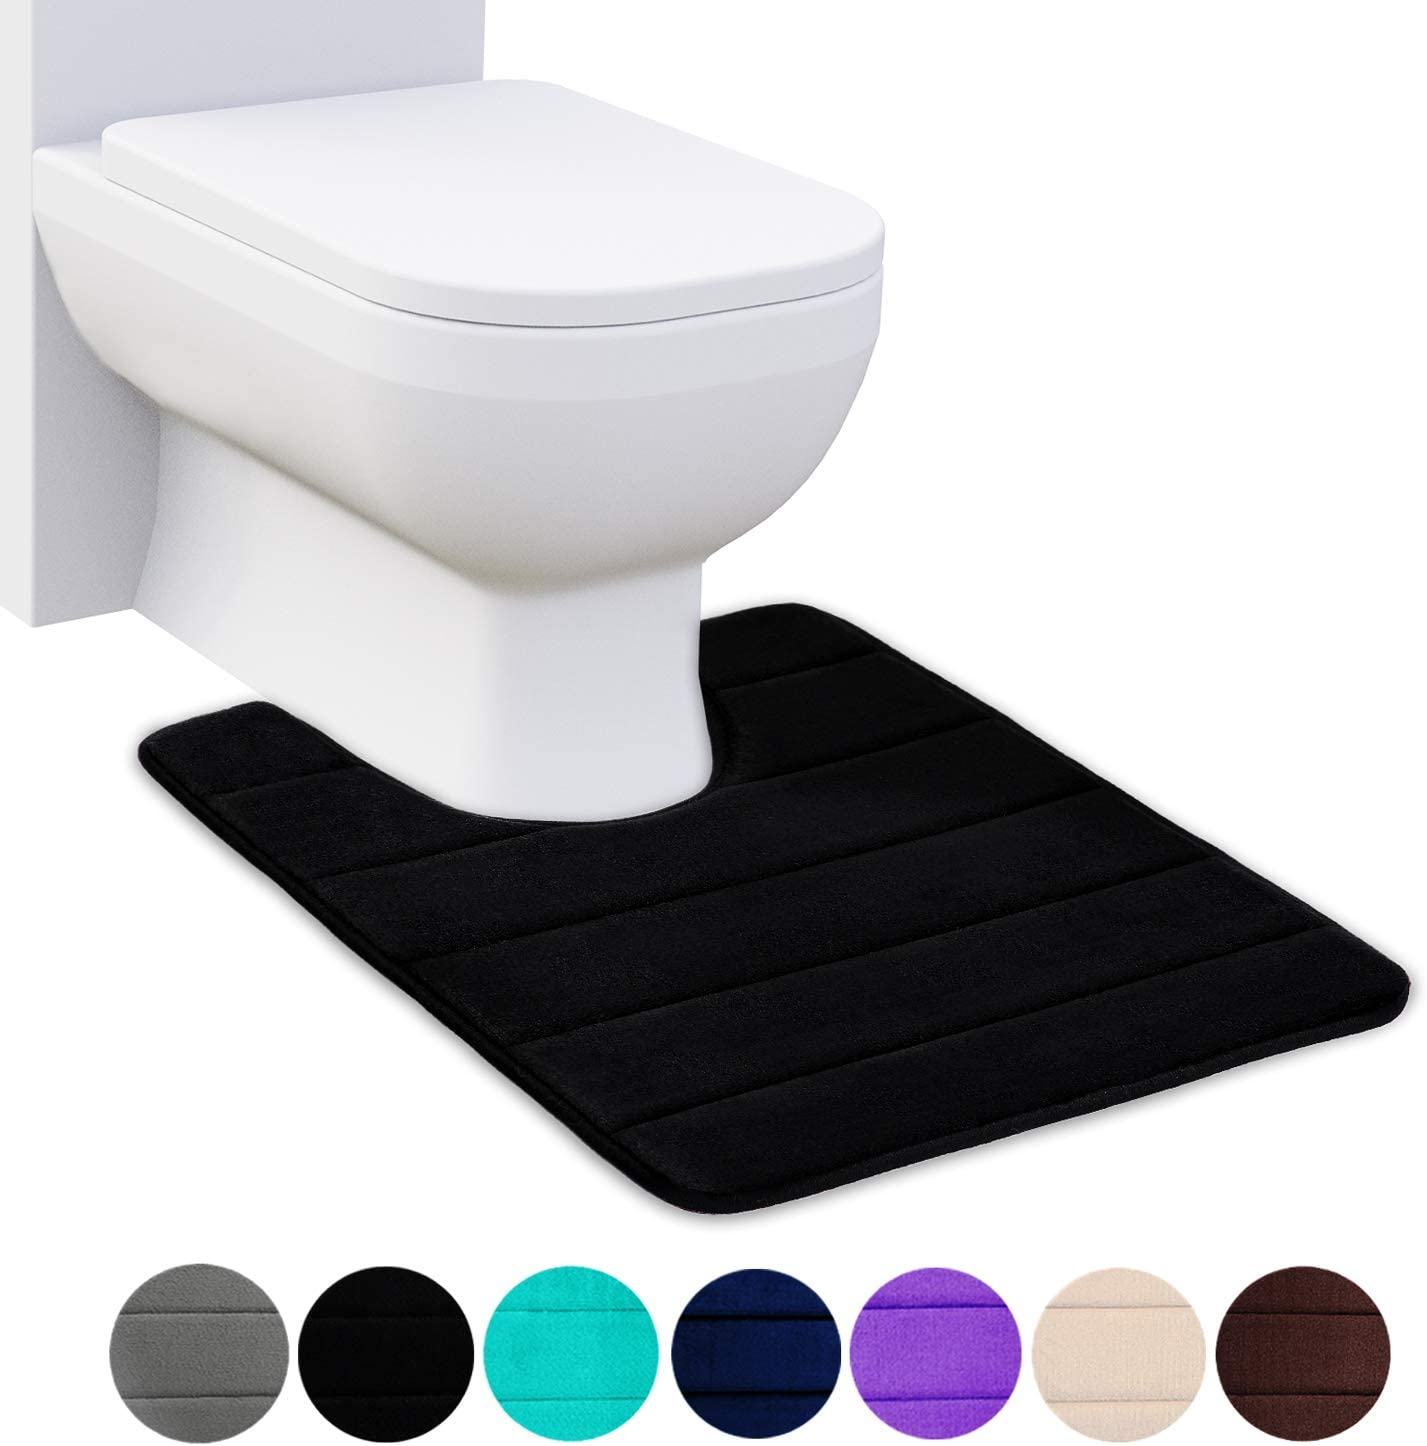 "Buganda Memory Foam Contour Toilet Bath Rug, U-Shaped Non Slip Absorbent Thick Soft Washable Bathroom Rugs, Floor Carpet Bath Mat for Bathroom Sink Toilet (20"" x 24"", Black)"